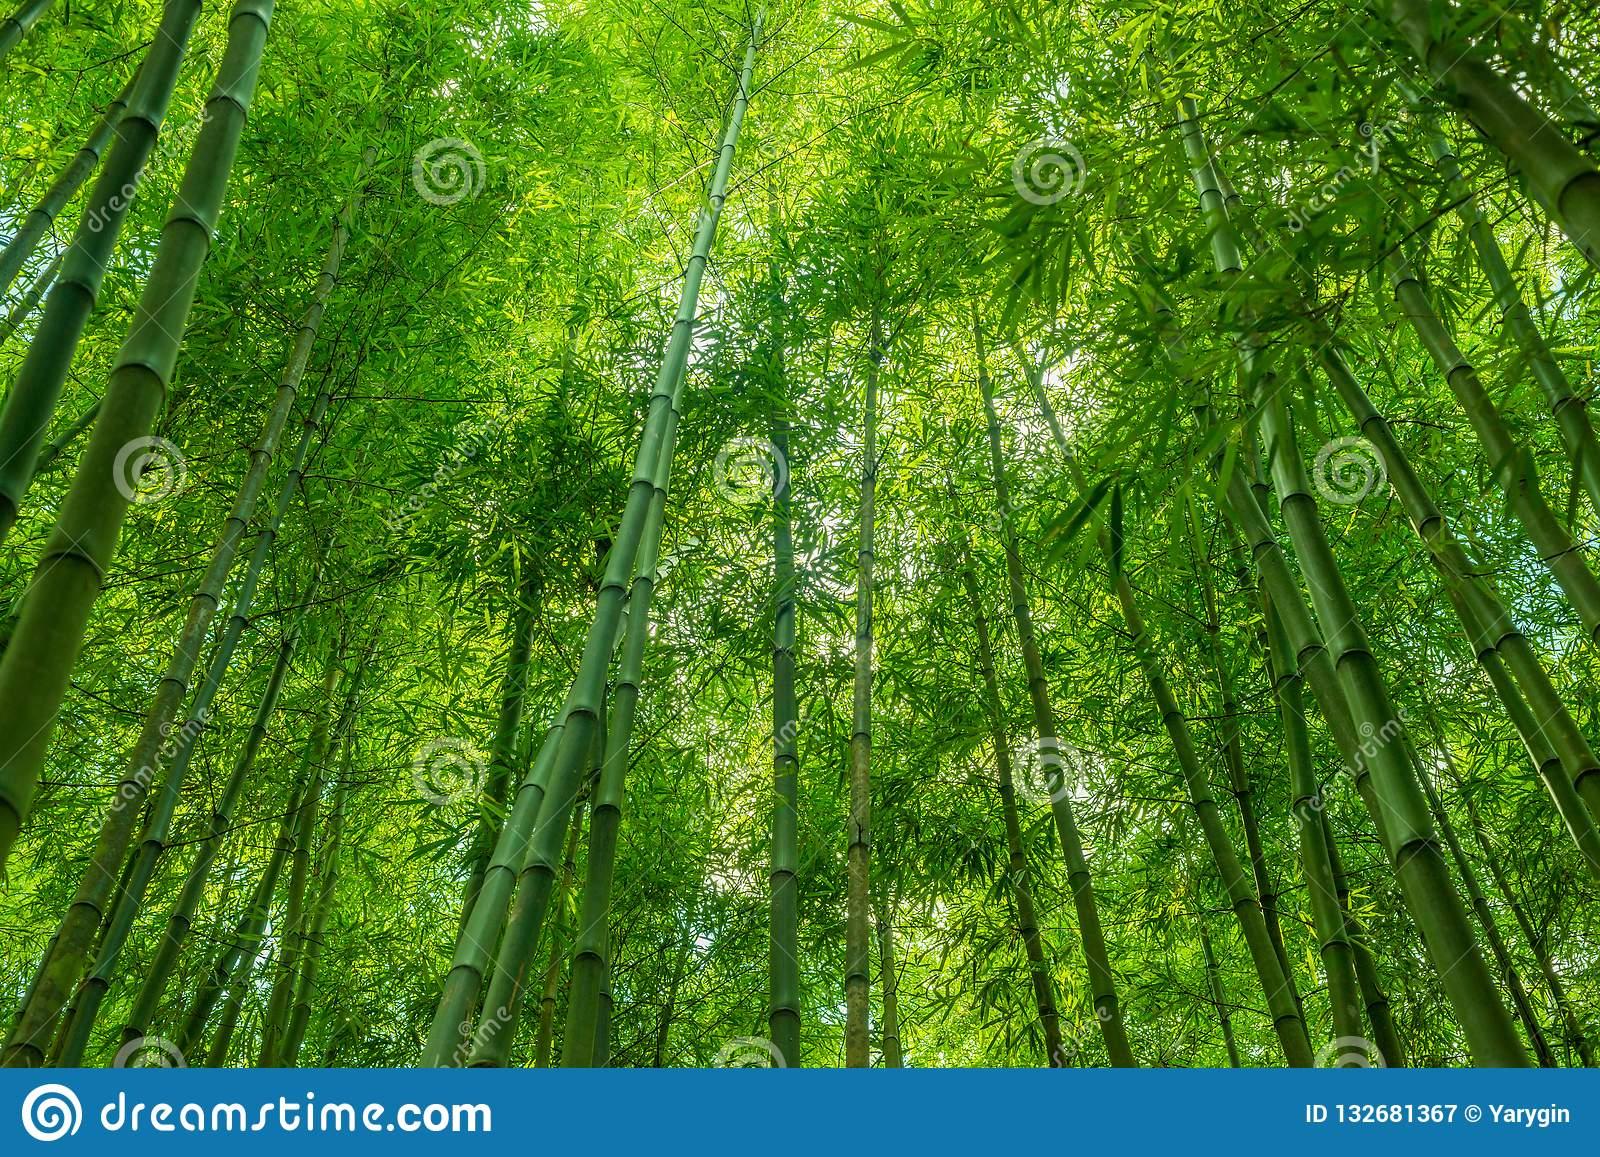 Bamboo Forest Wallpaper - Bamboo Green Nature Background - HD Wallpaper